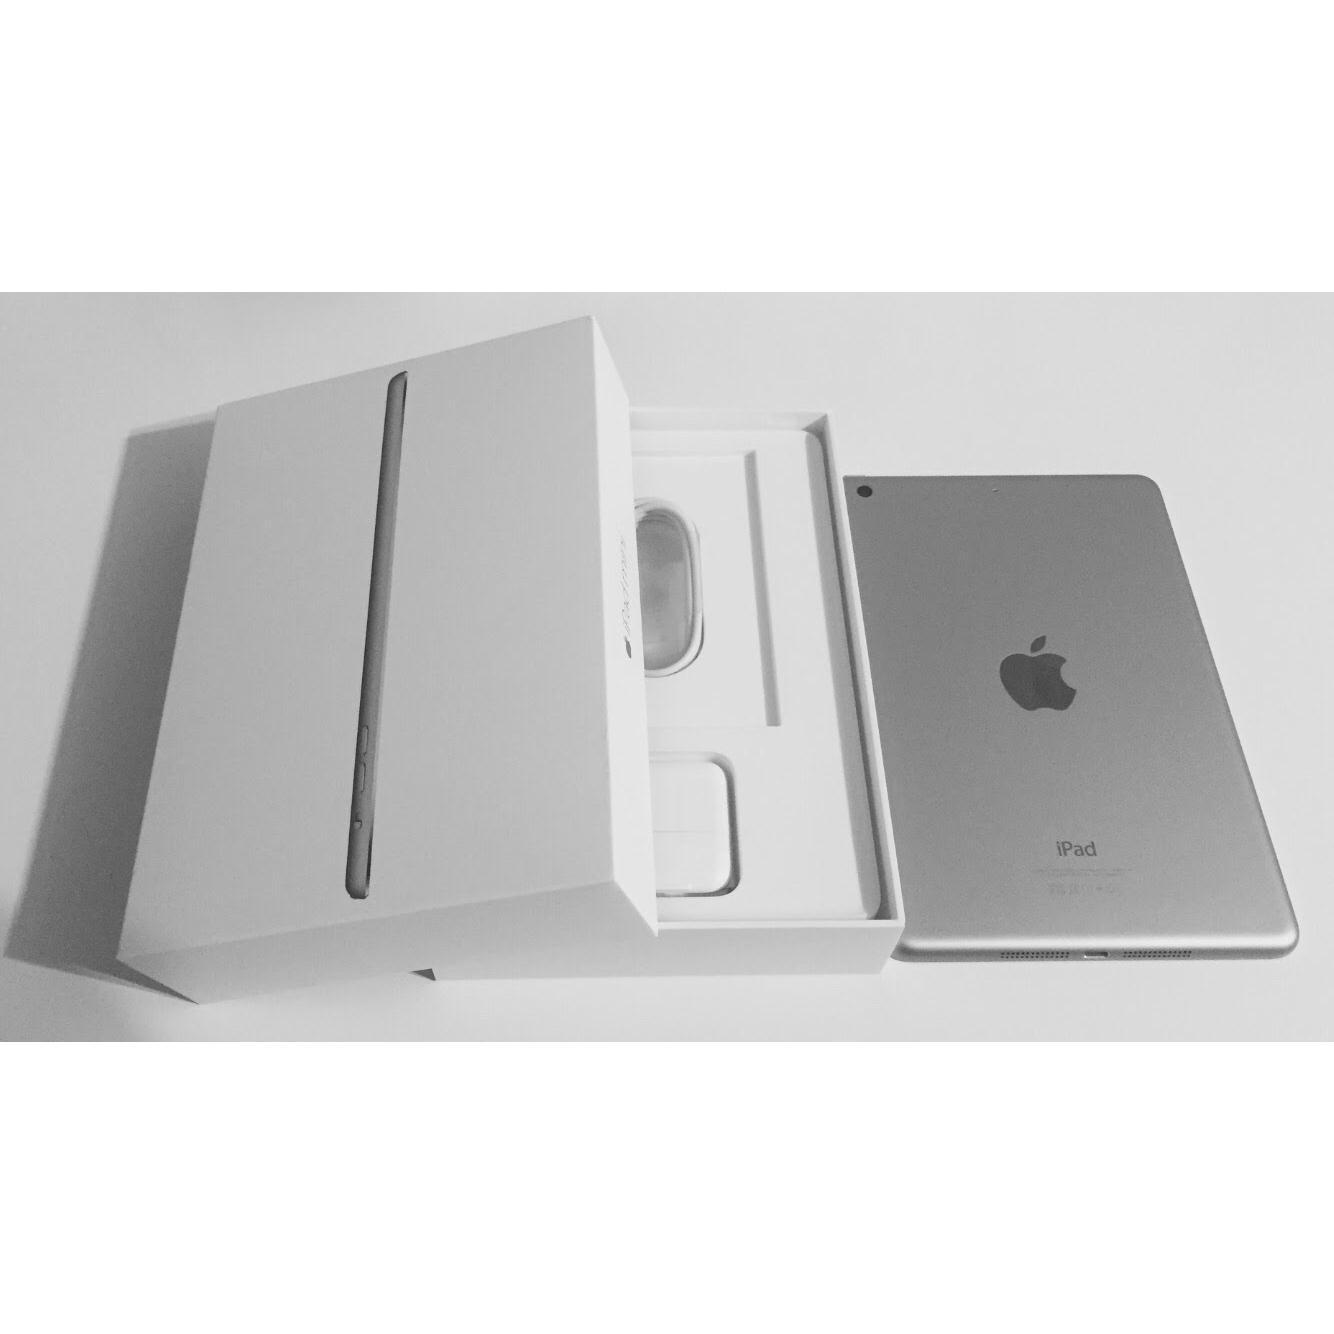 mini-4-4g-wifi-64g-gray-99-siver-gold-200k